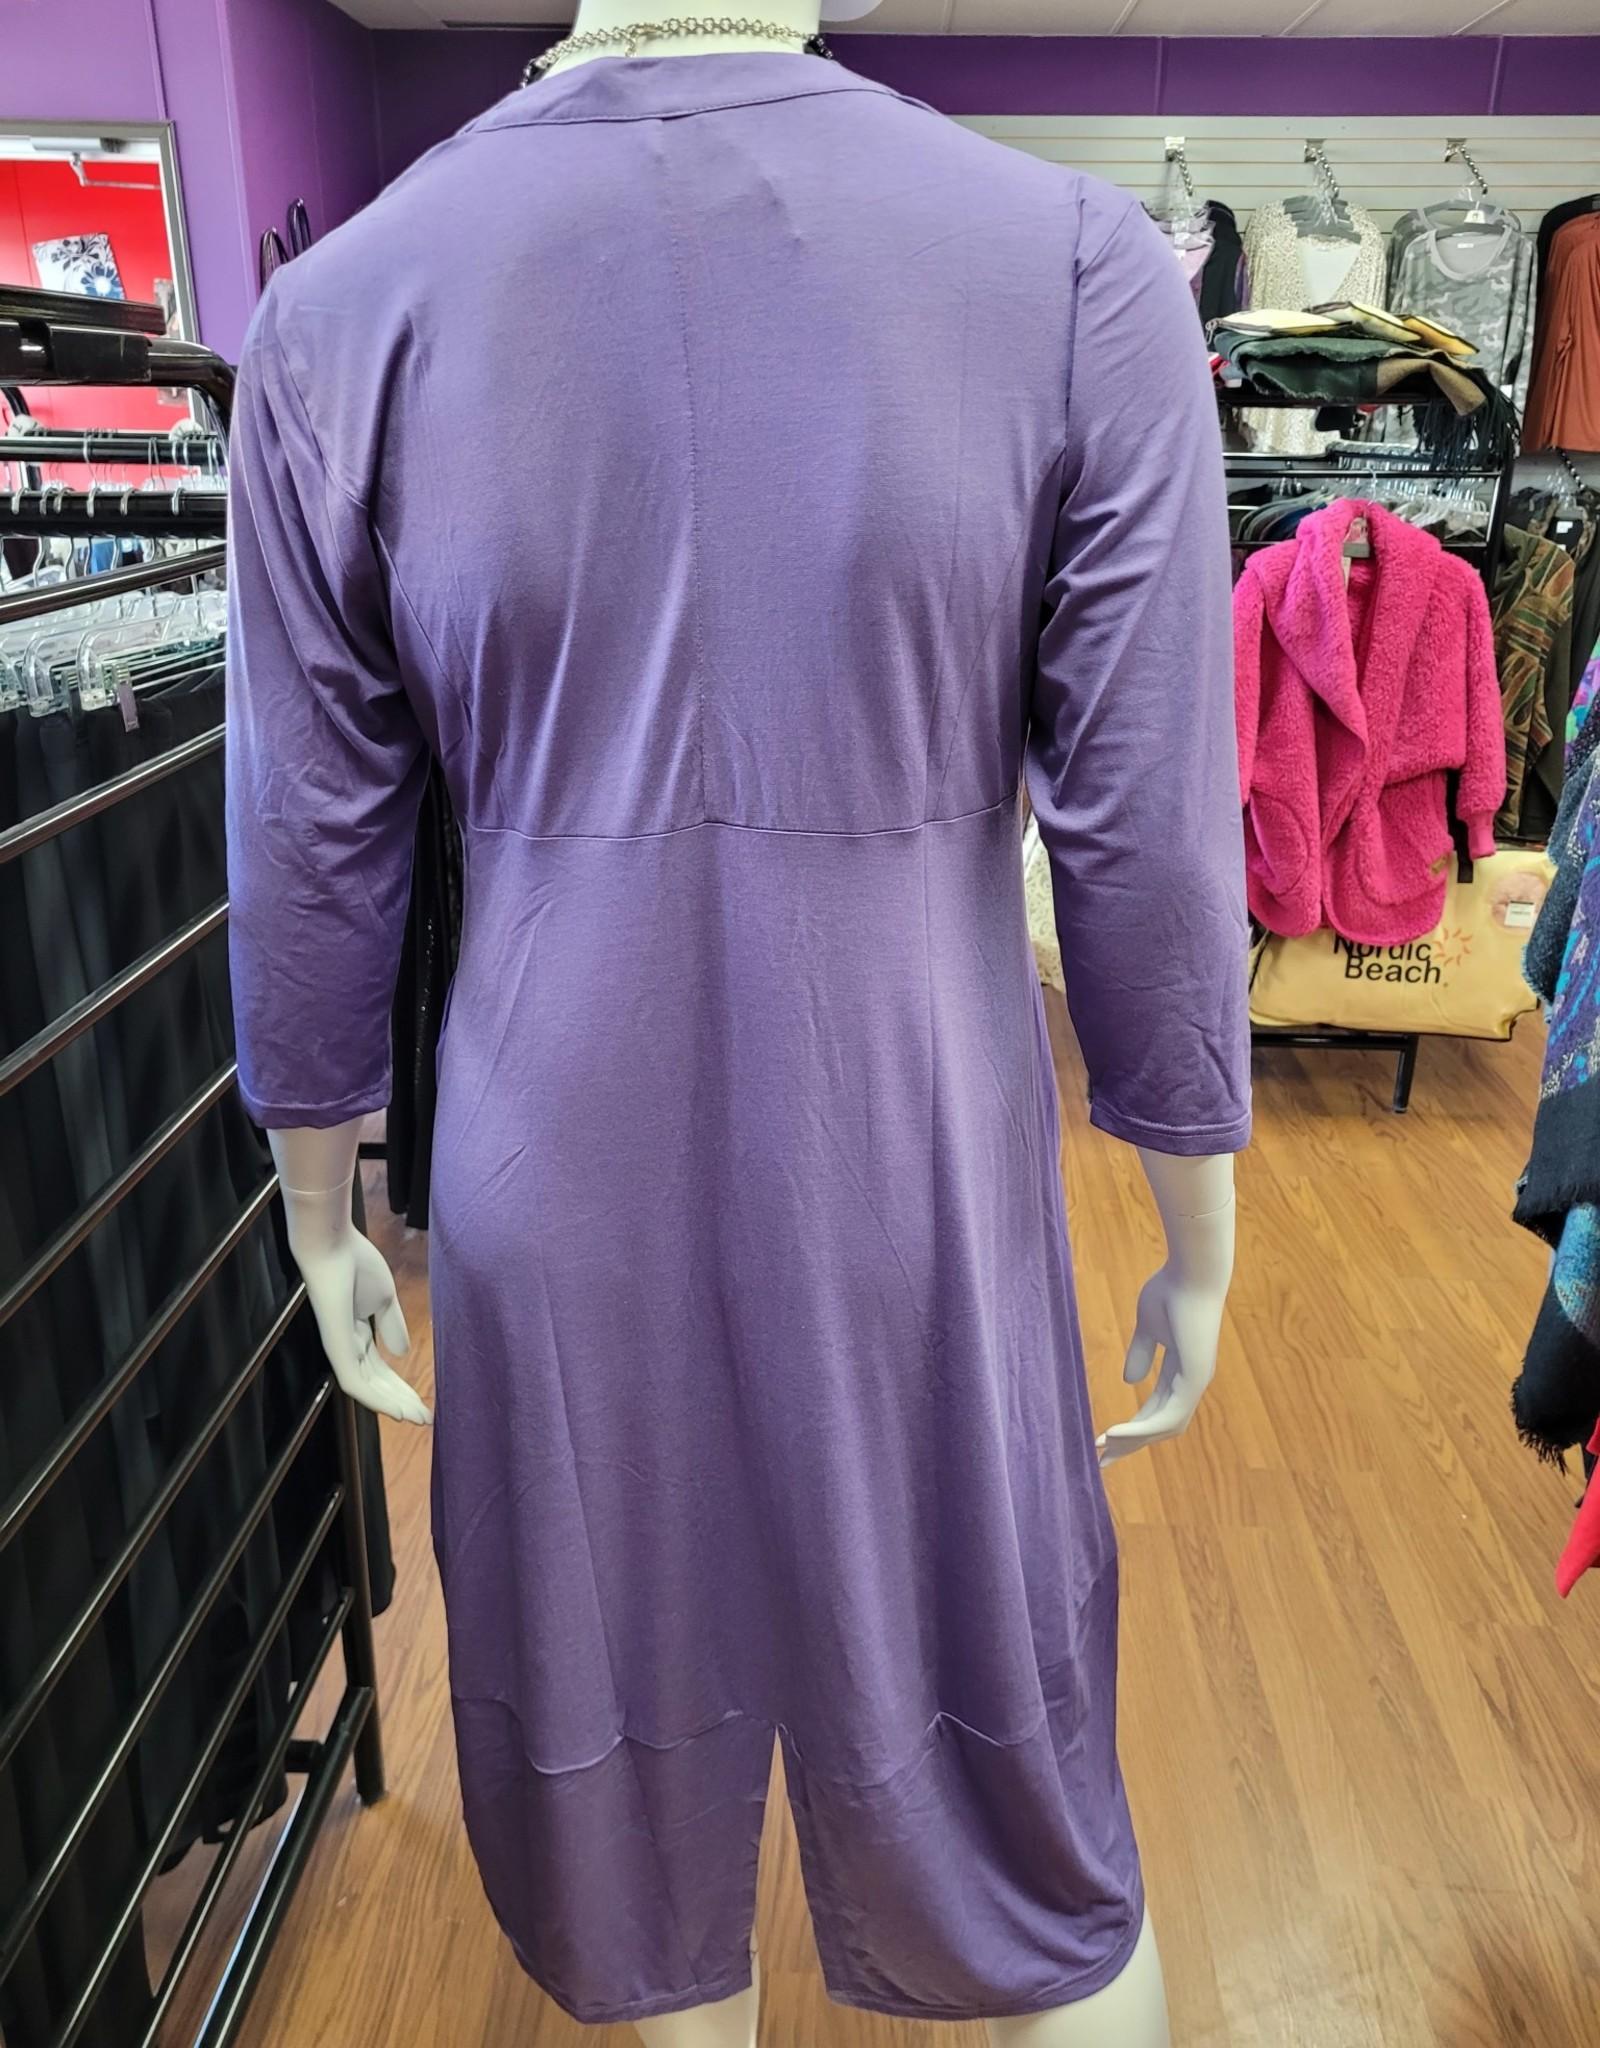 NYAH PRINCESS CUT DRESS YP00464